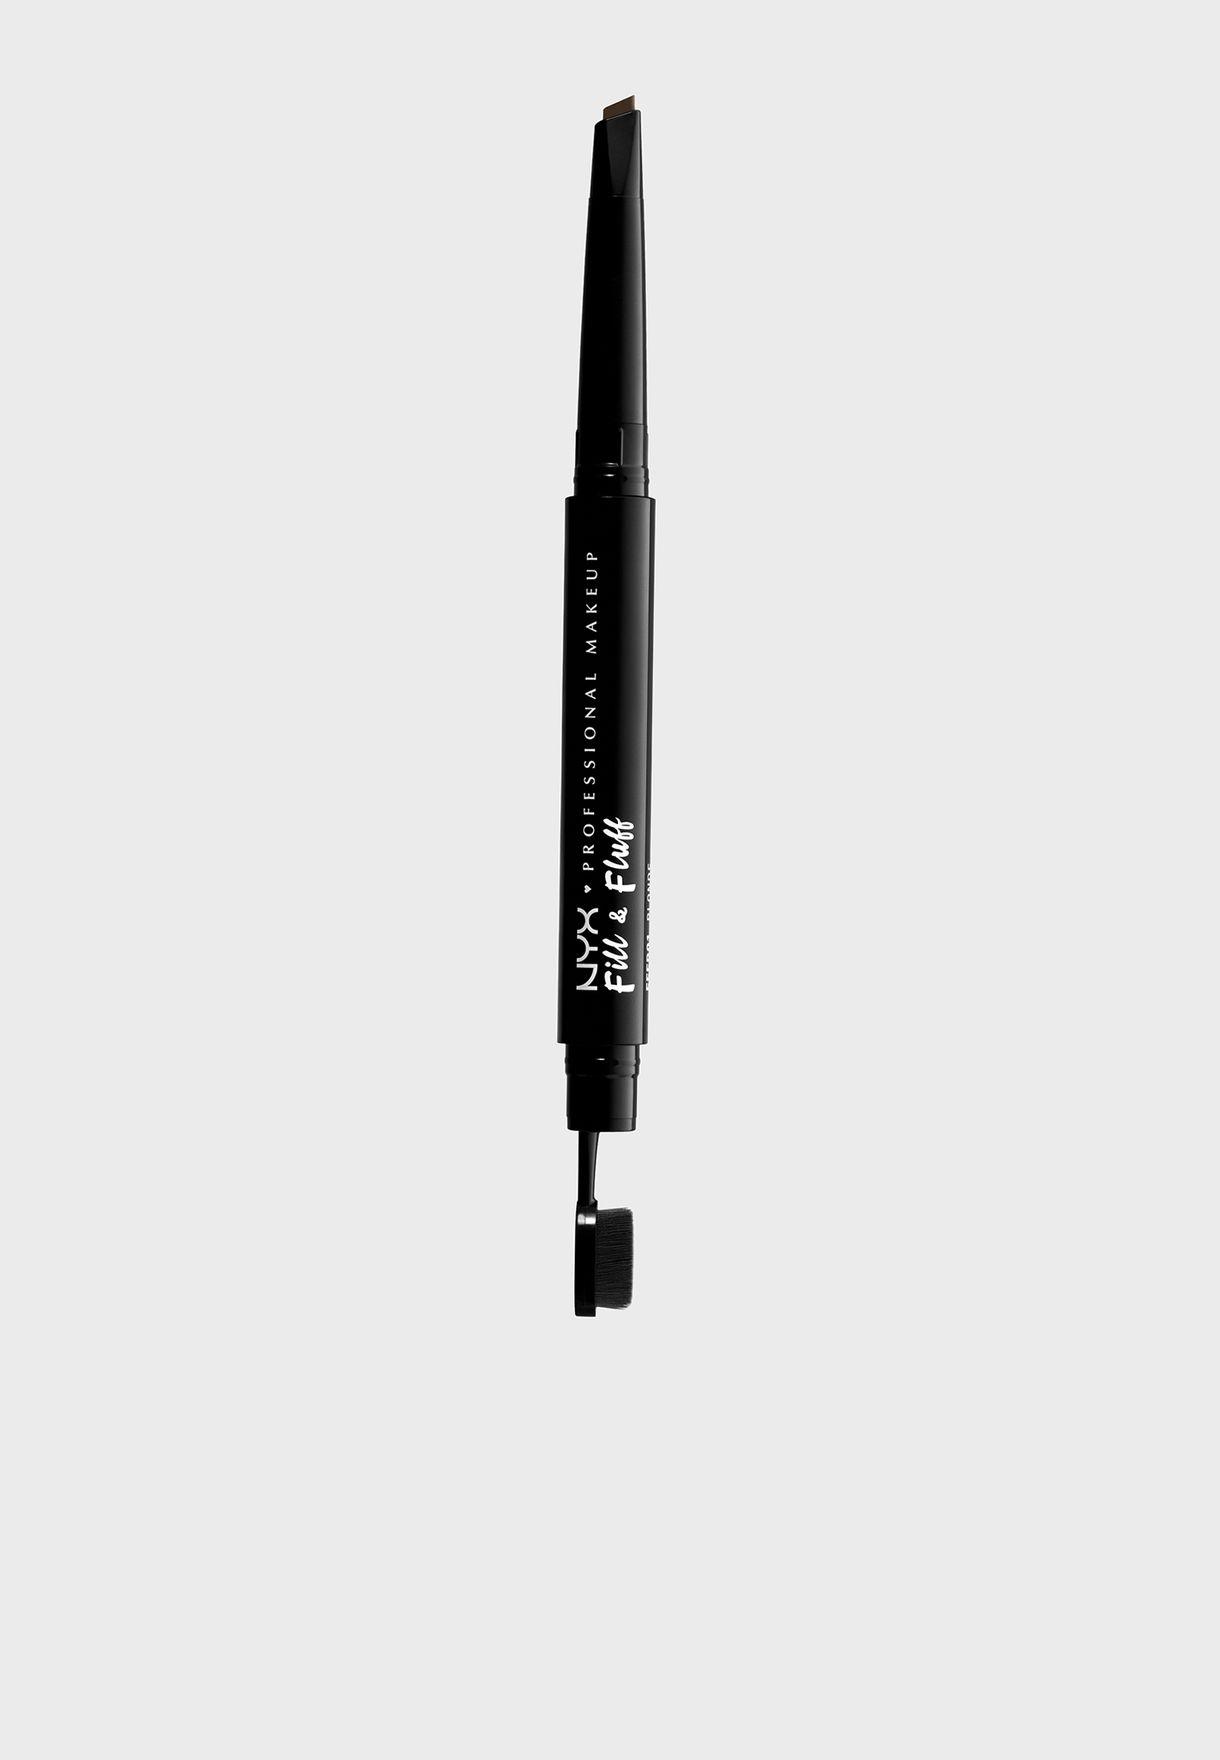 قلم حواجب بوميد فيل اند فلاف - اسبريسو